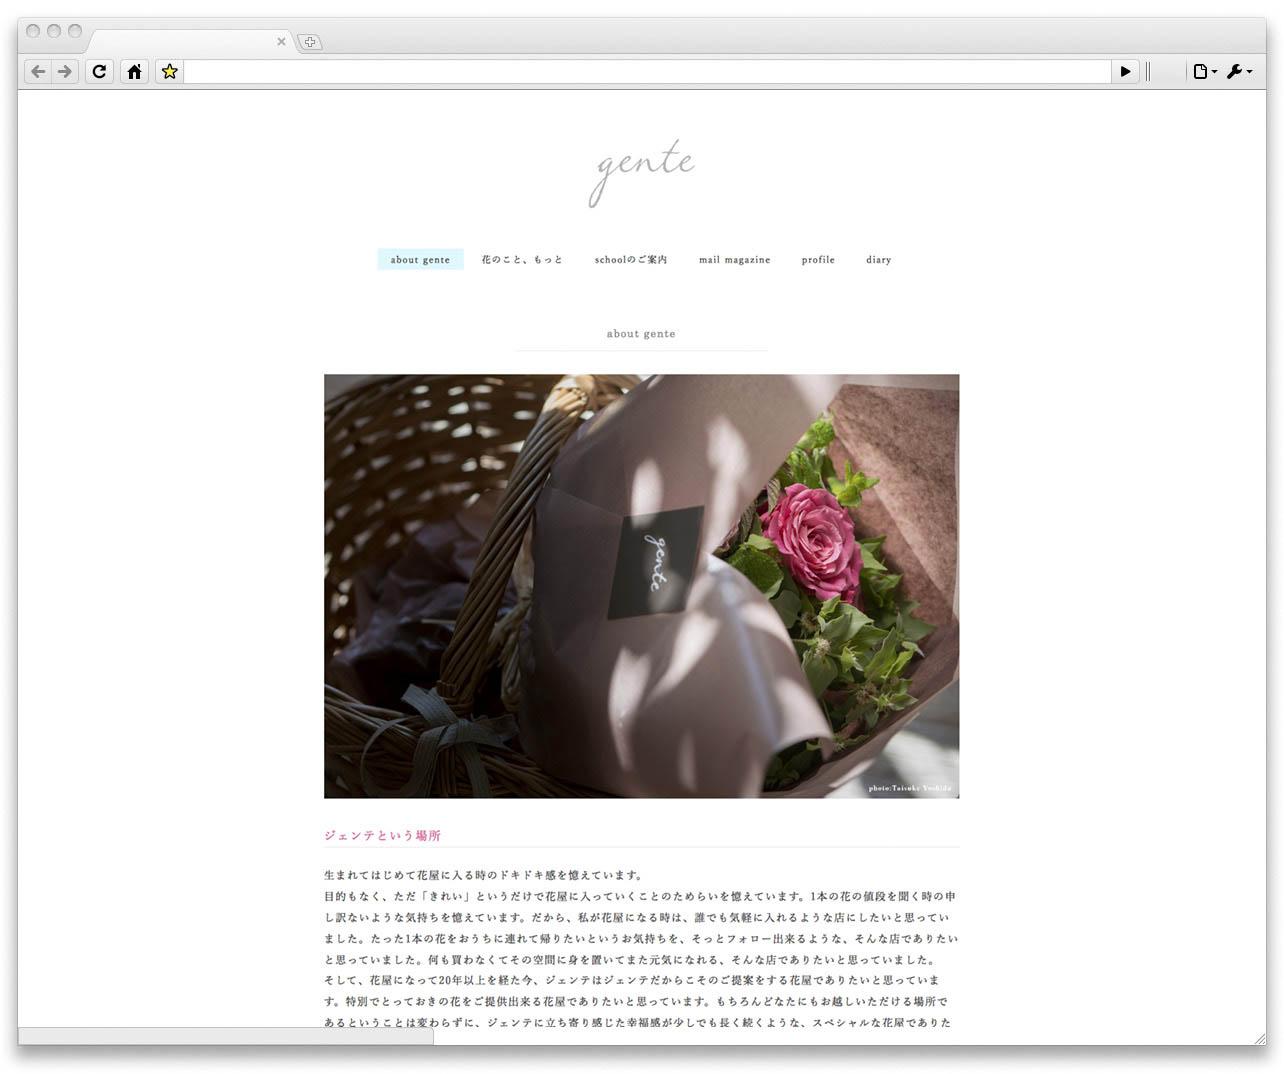 gente webデザイン conceptページ